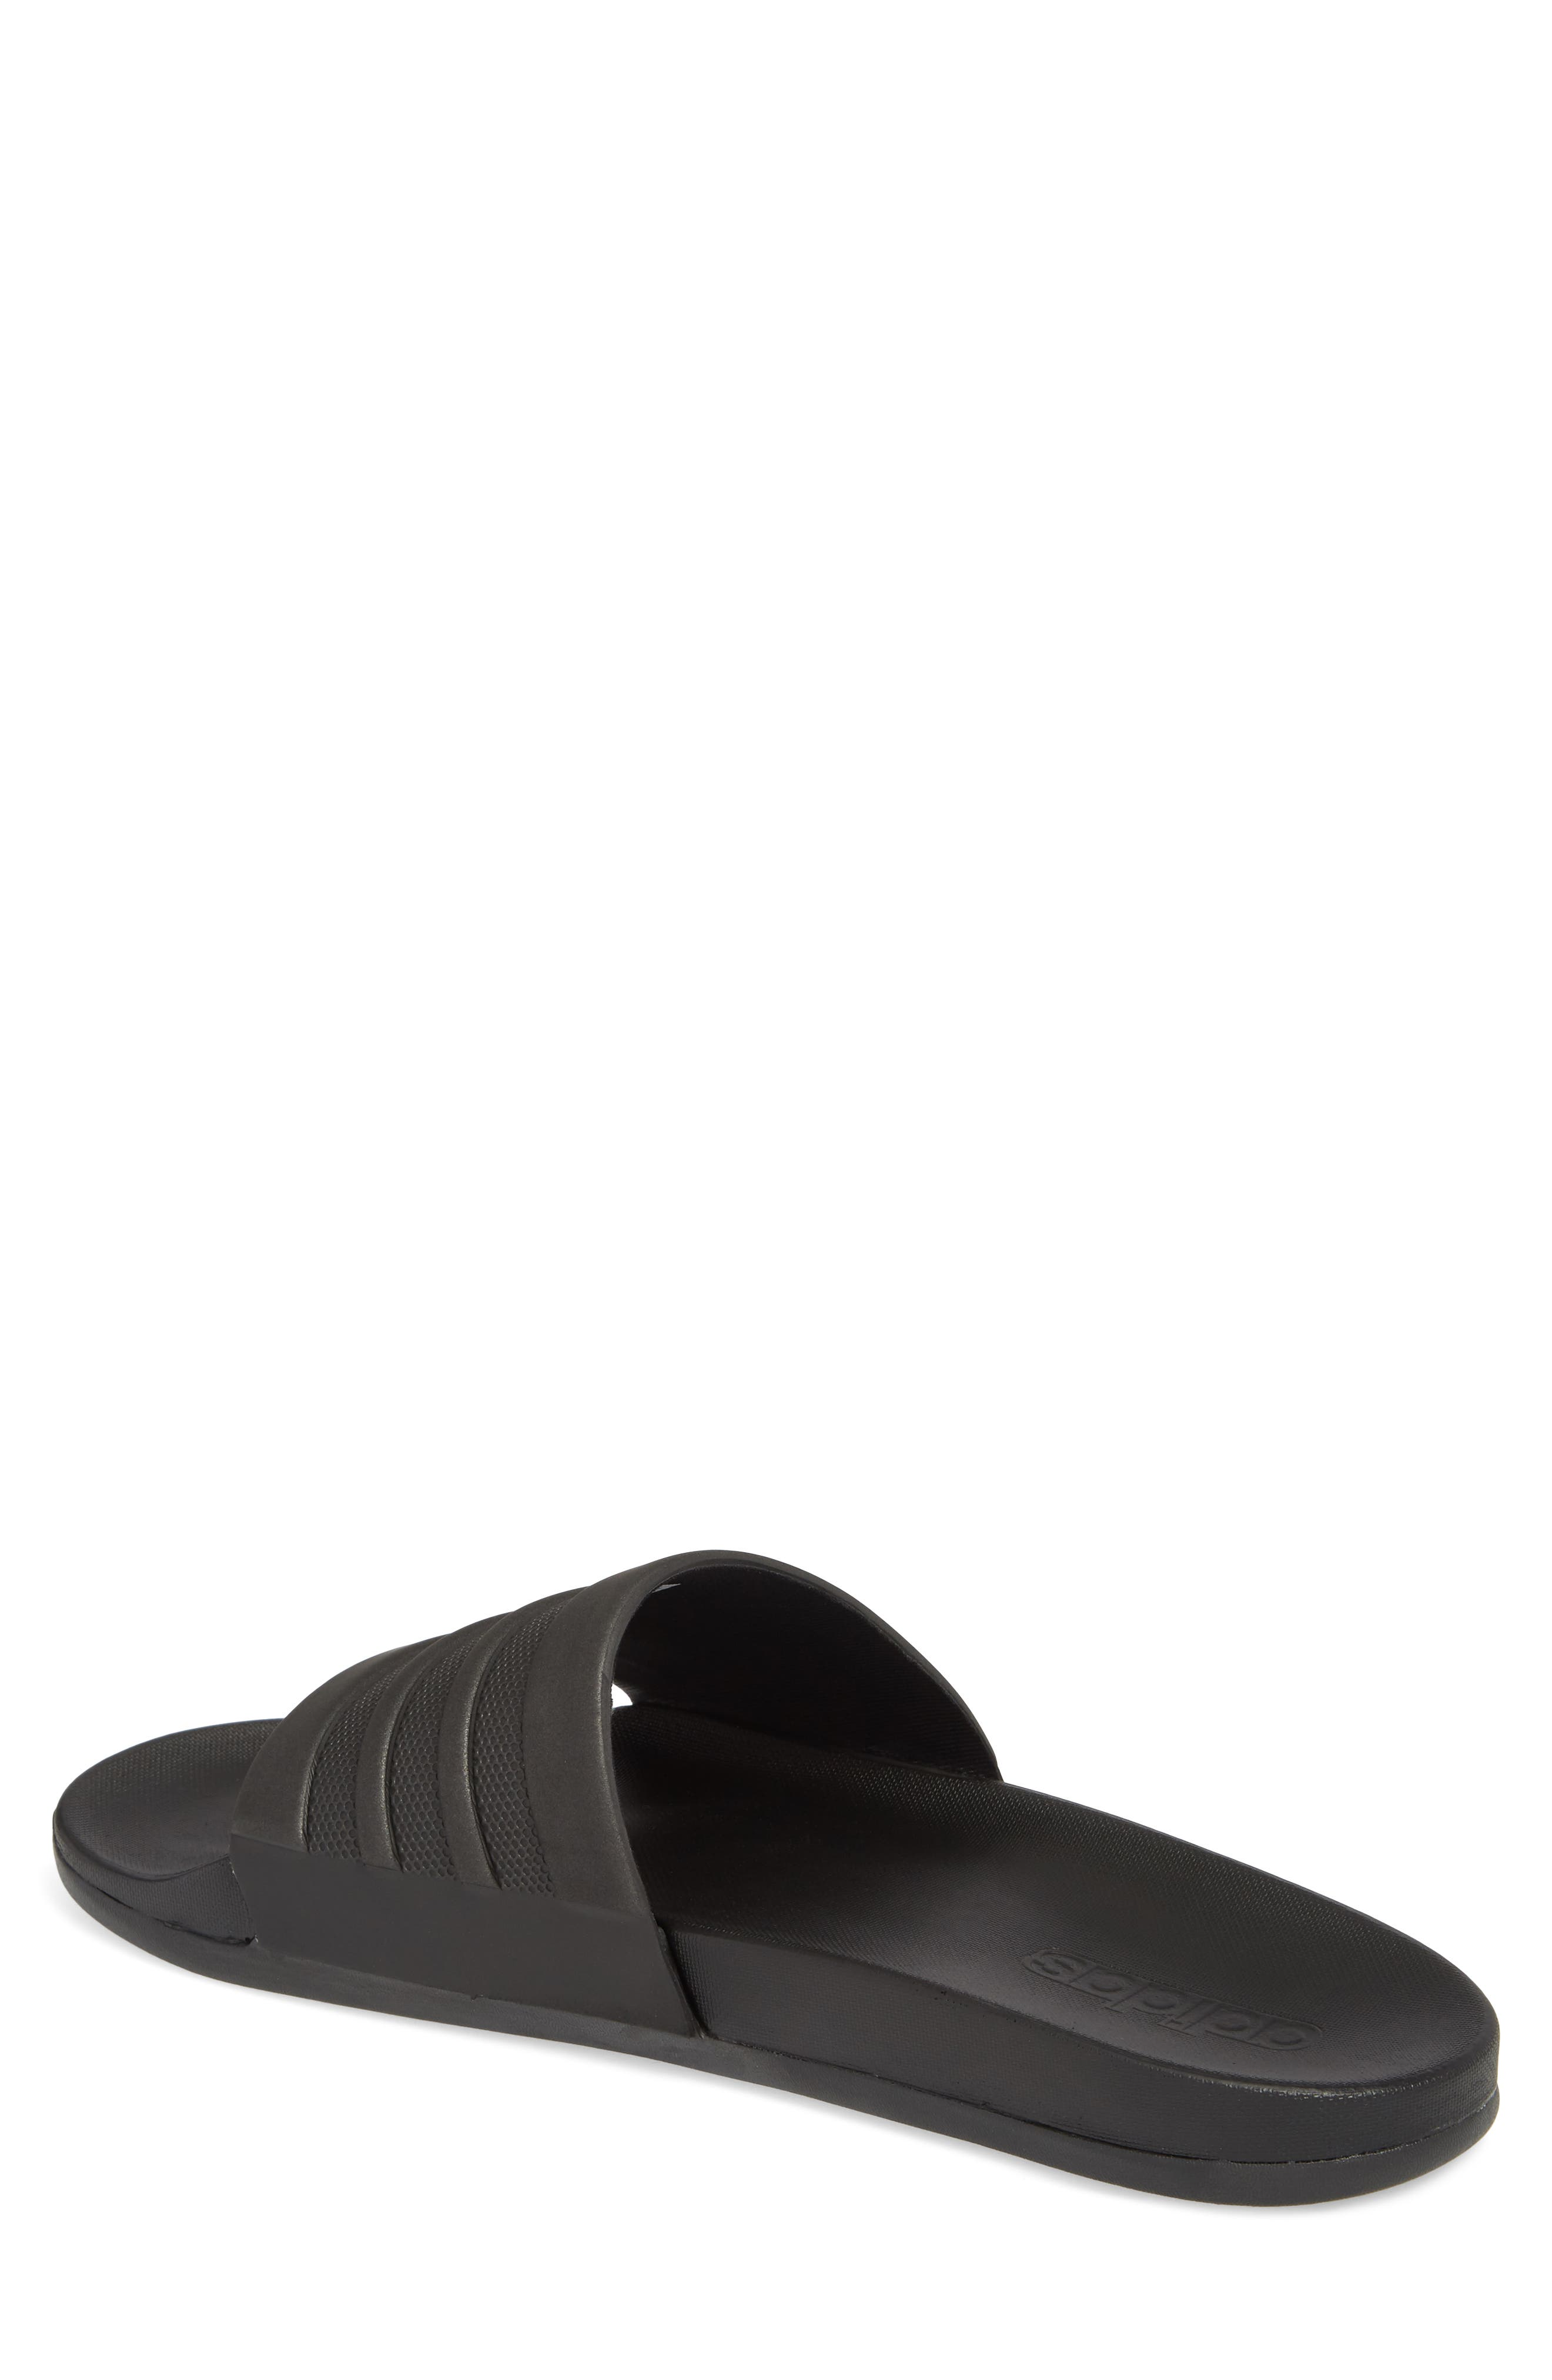 ADIDAS, Adilette Cloudfoam Mono Sport Slide Sandal, Alternate thumbnail 2, color, BLACK/ BLACK